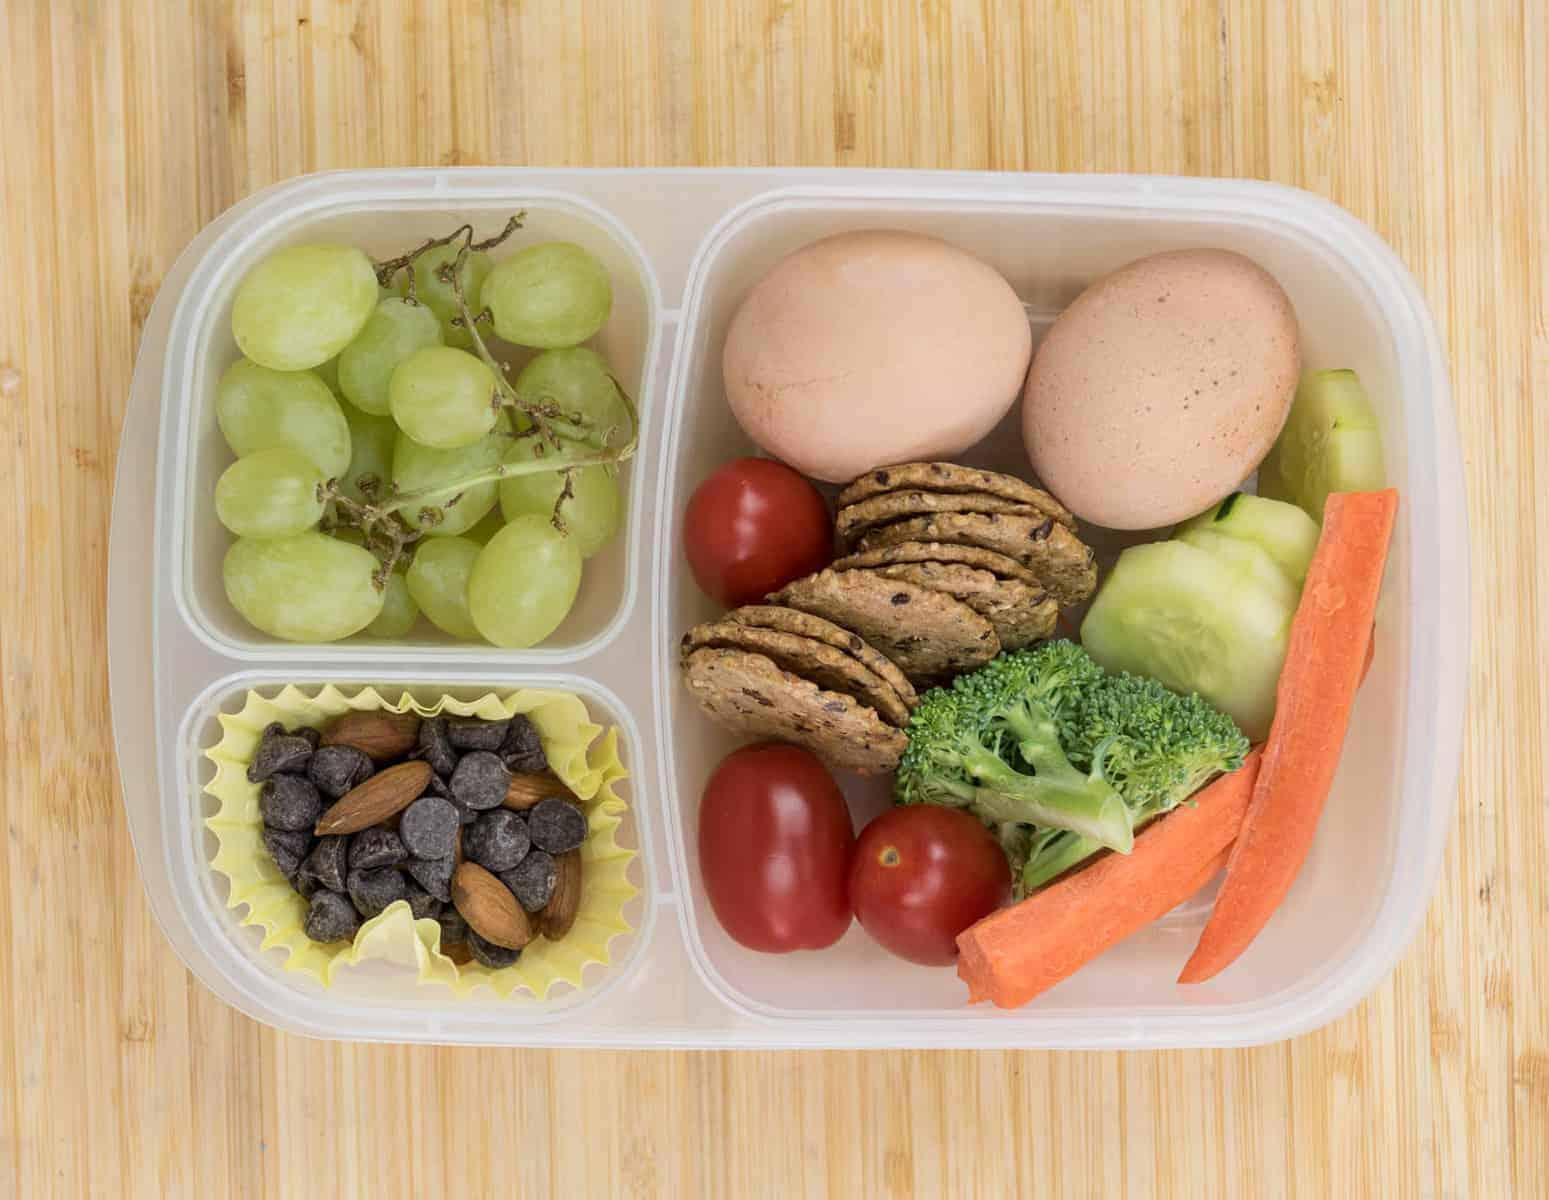 Lunch Box Ideas - Boiled Egg Lunch Box